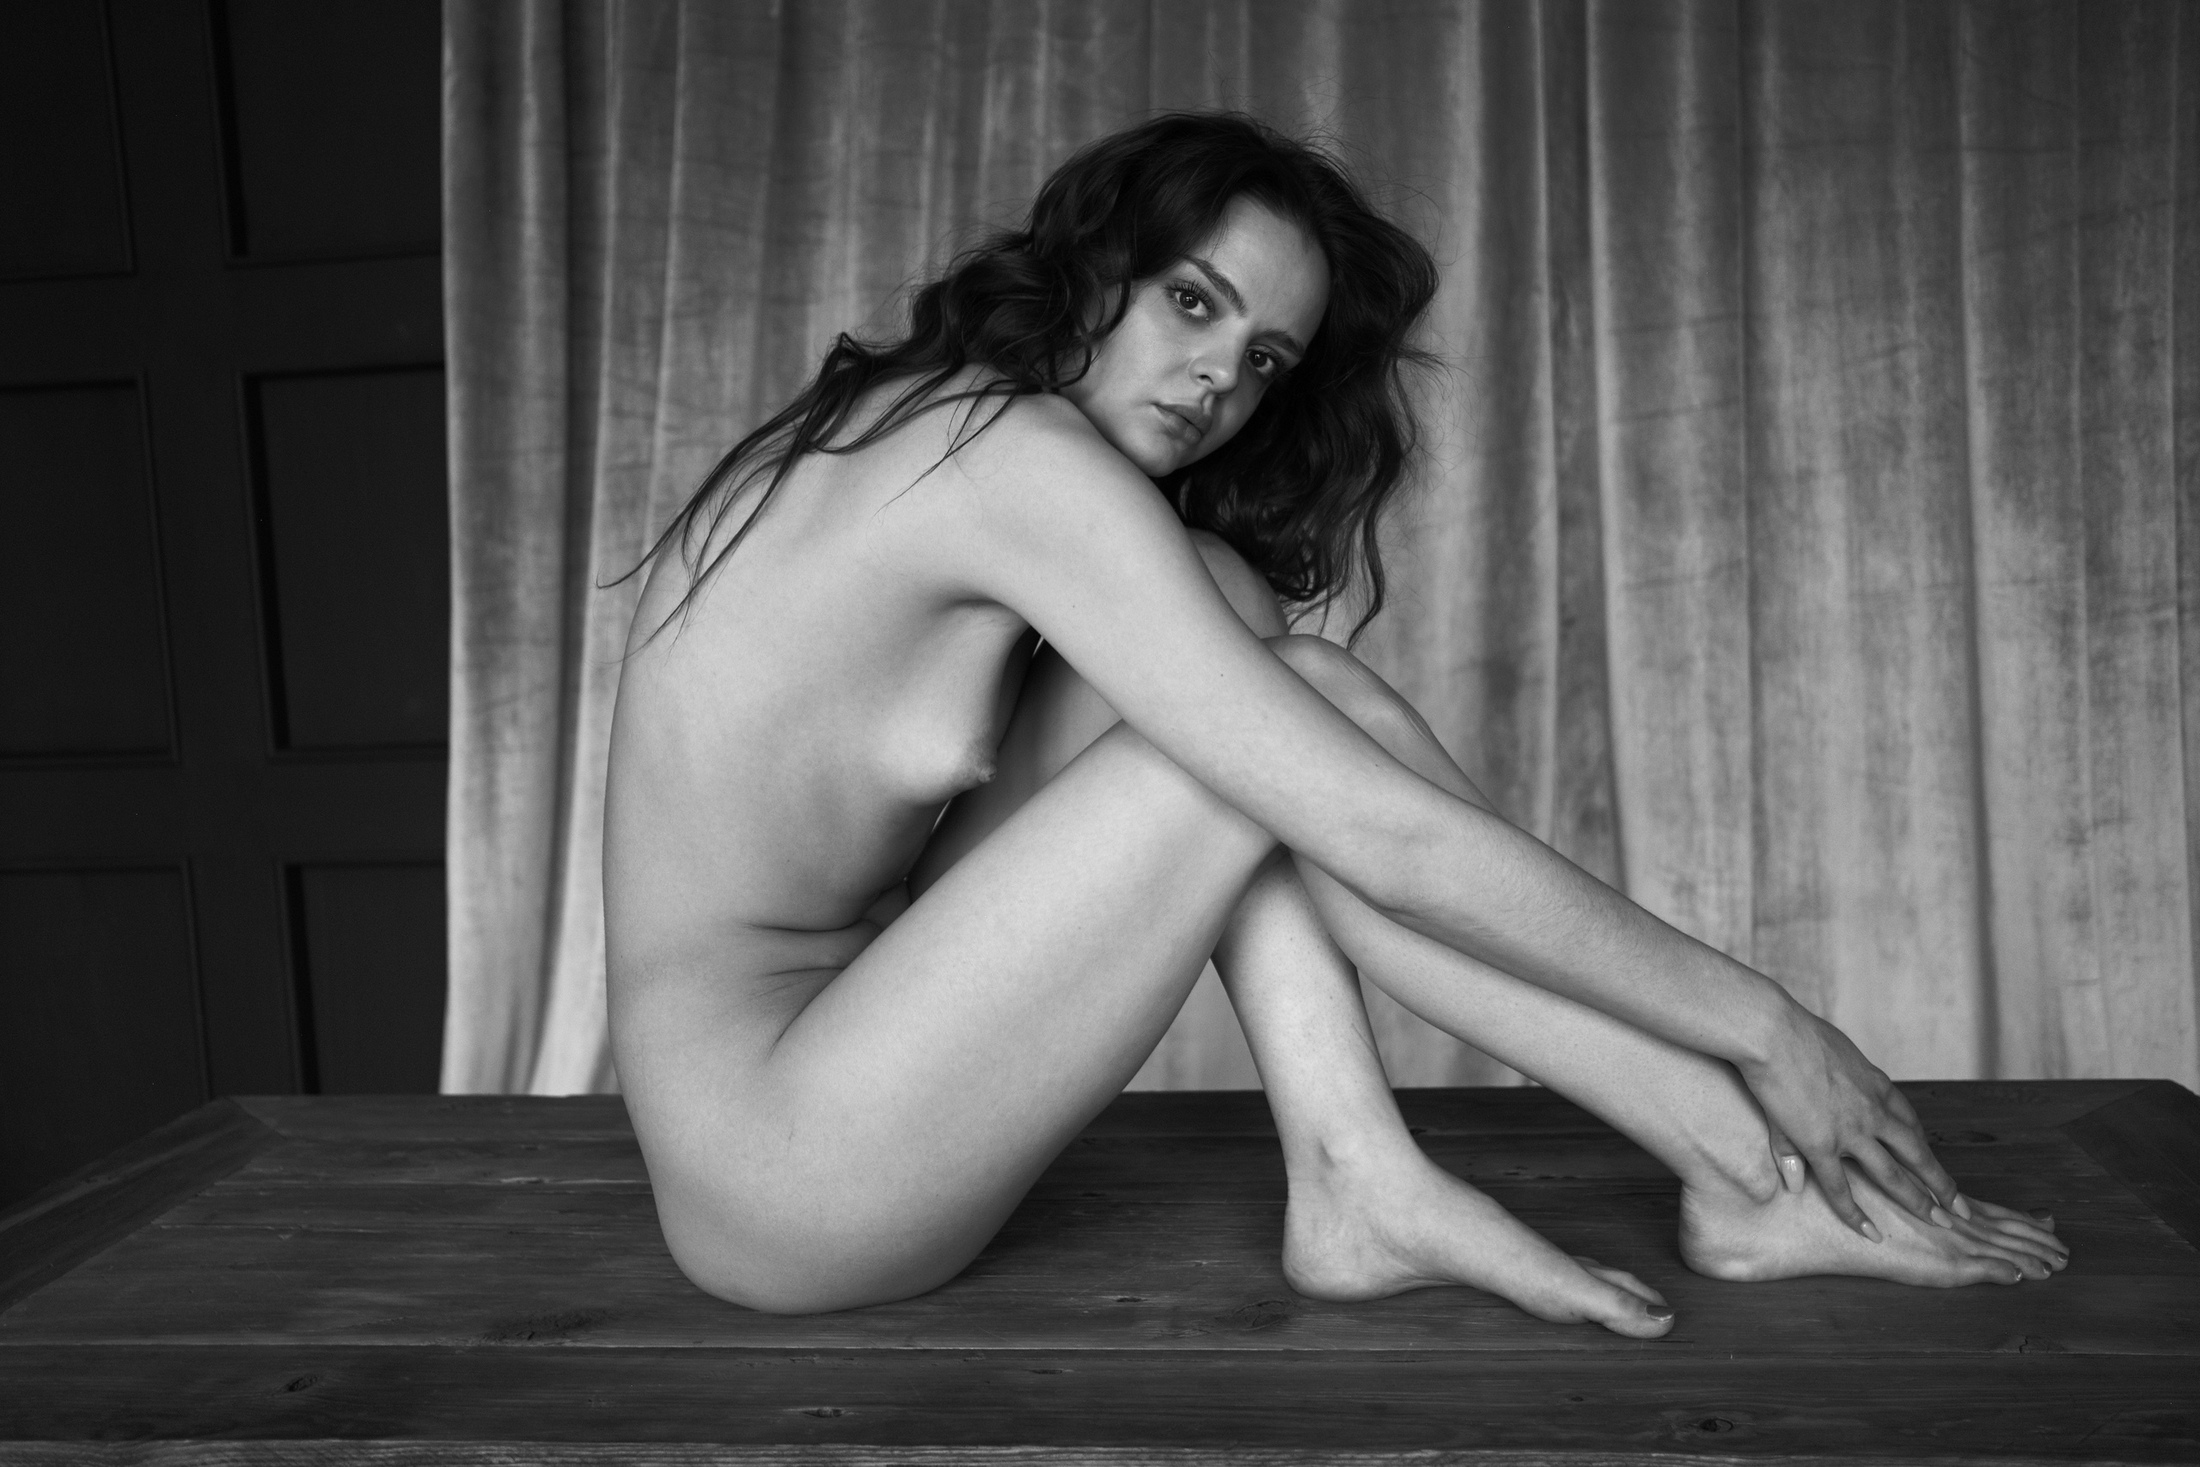 Katrin Weiss - Denis Nikolenko photoshoot